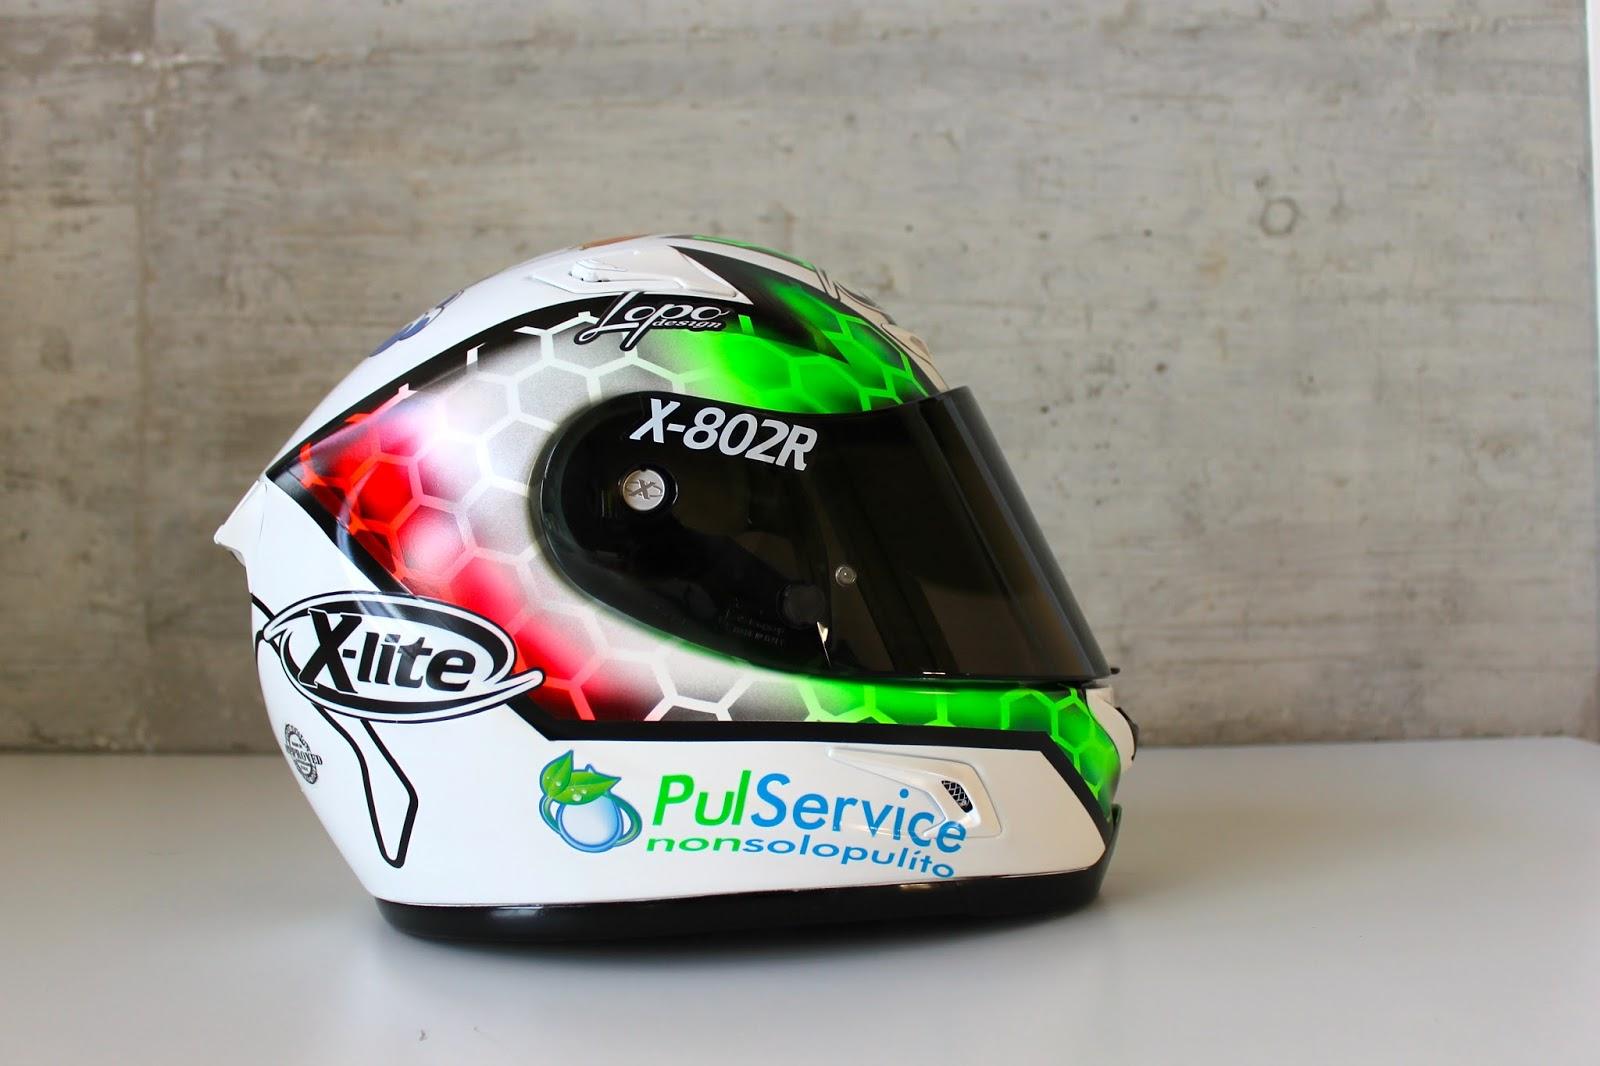 racing helmets garage x lite x 802r c gobbi 2015 by. Black Bedroom Furniture Sets. Home Design Ideas